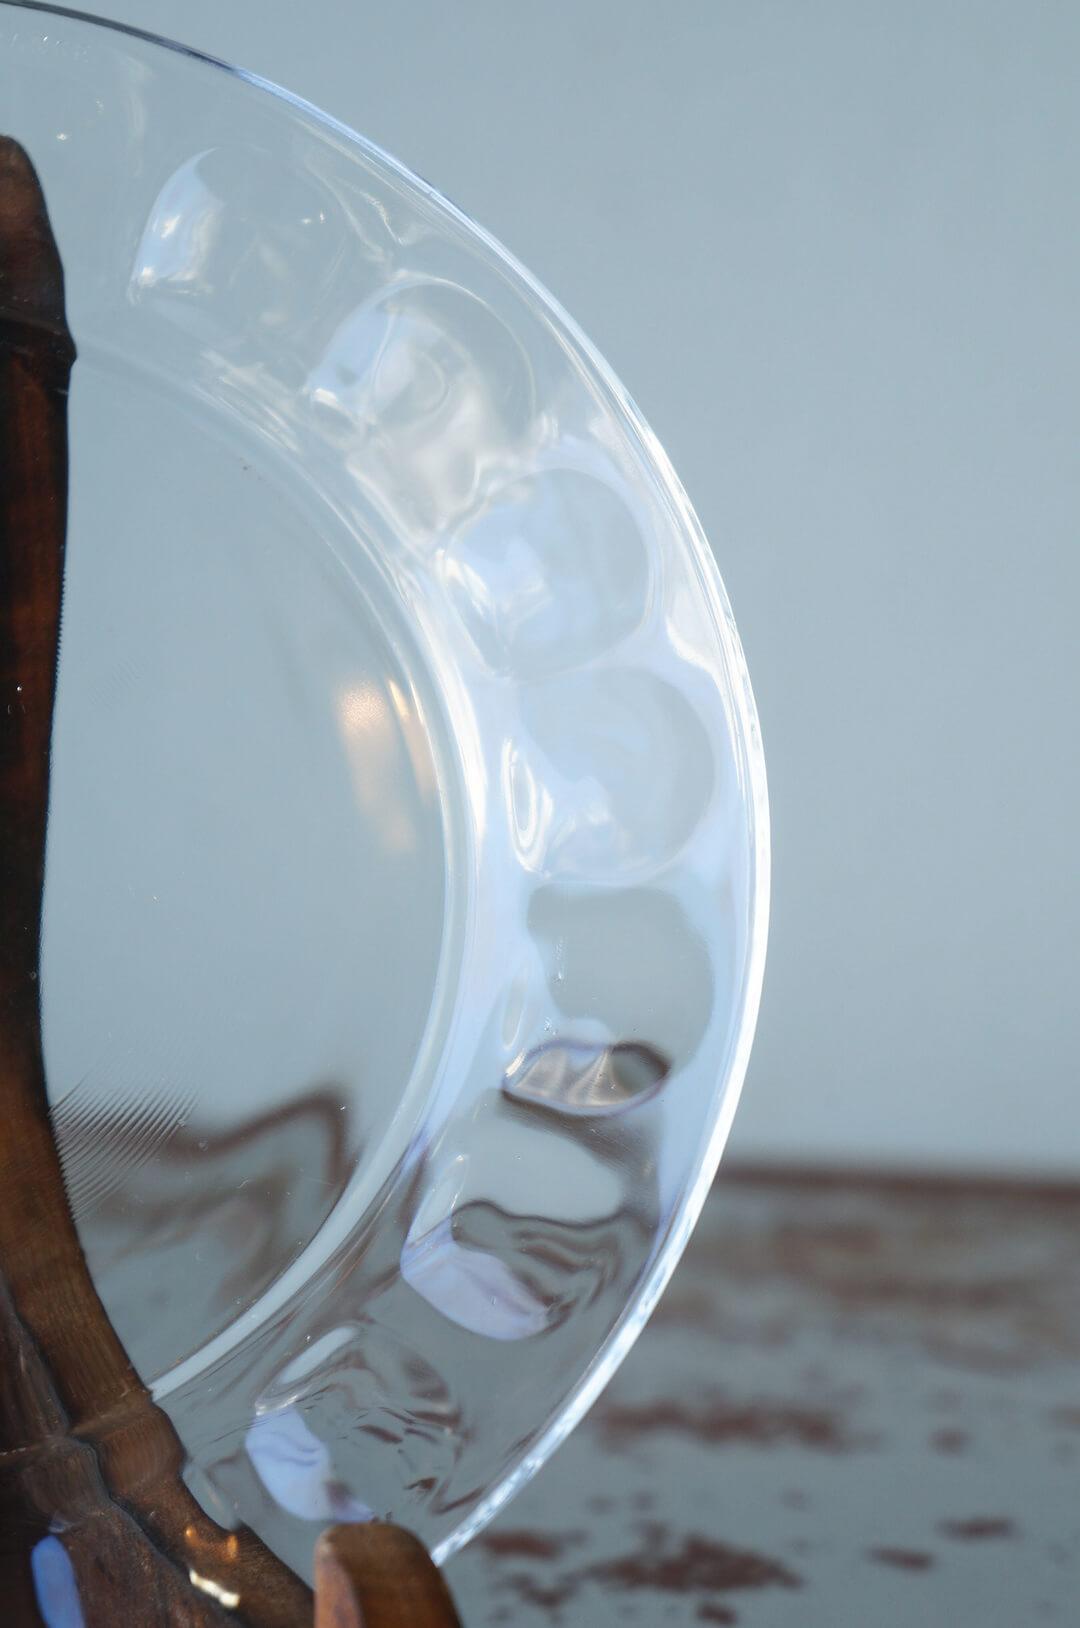 arcoroc Plate Glass Ware Made In France/アルコロック プレート ガラス フランス製 食器 レトロ スモールサイズ 2